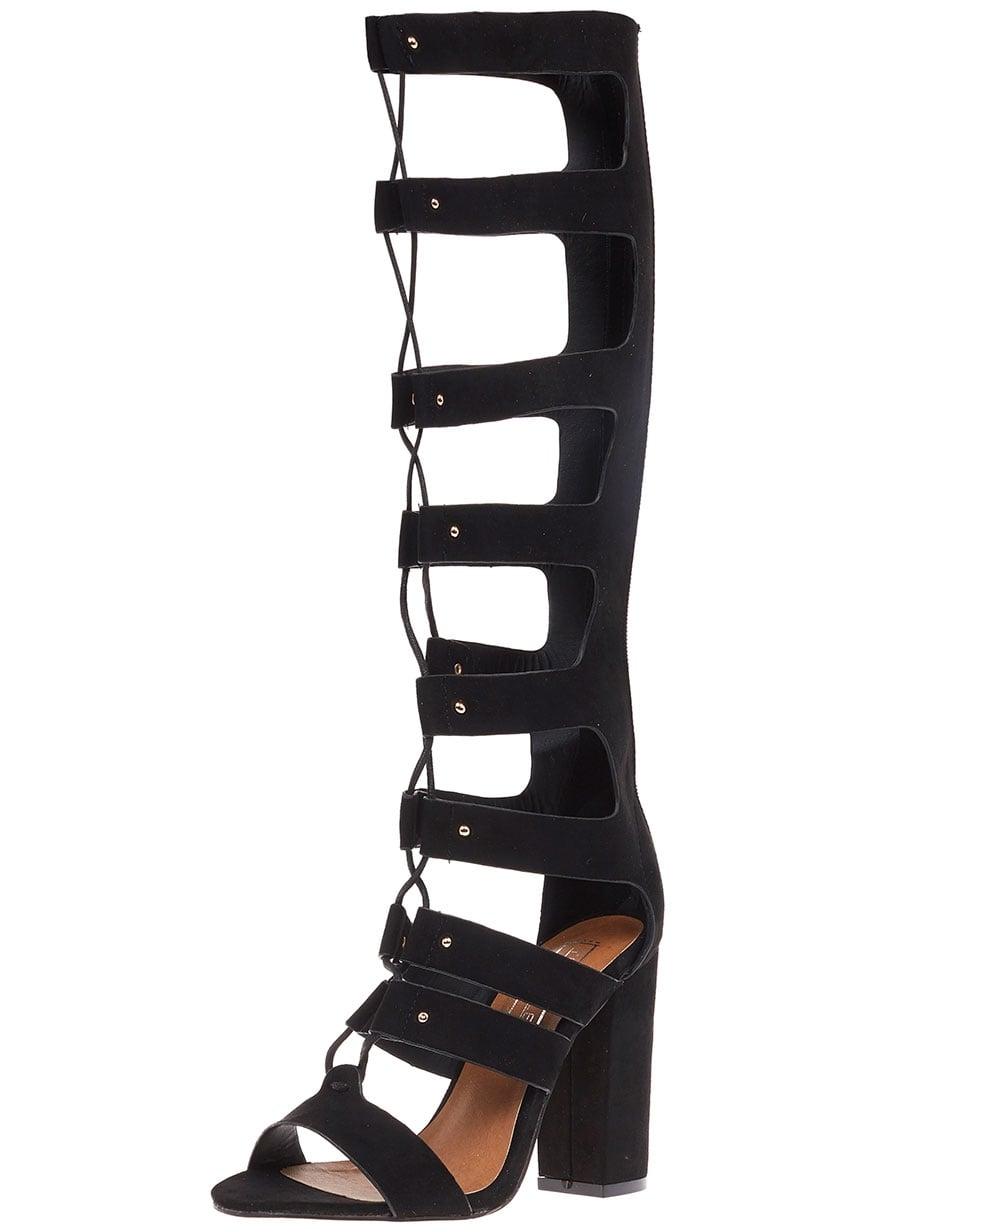 blue inc womens gladiator sandals black suede knee high